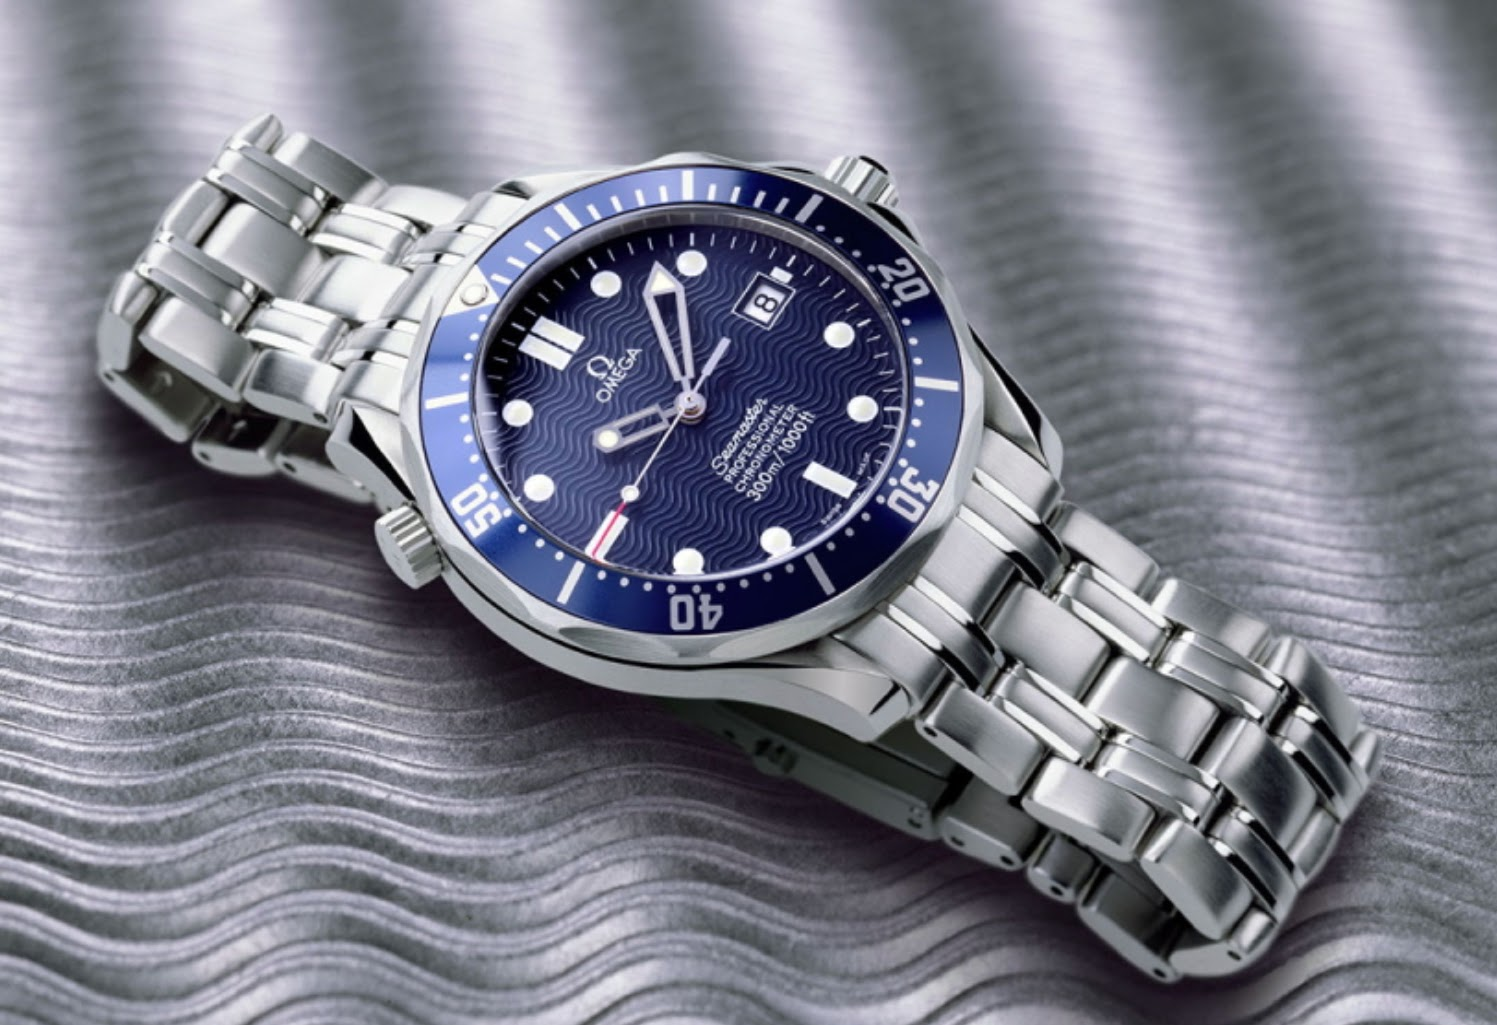 007 Omega watch